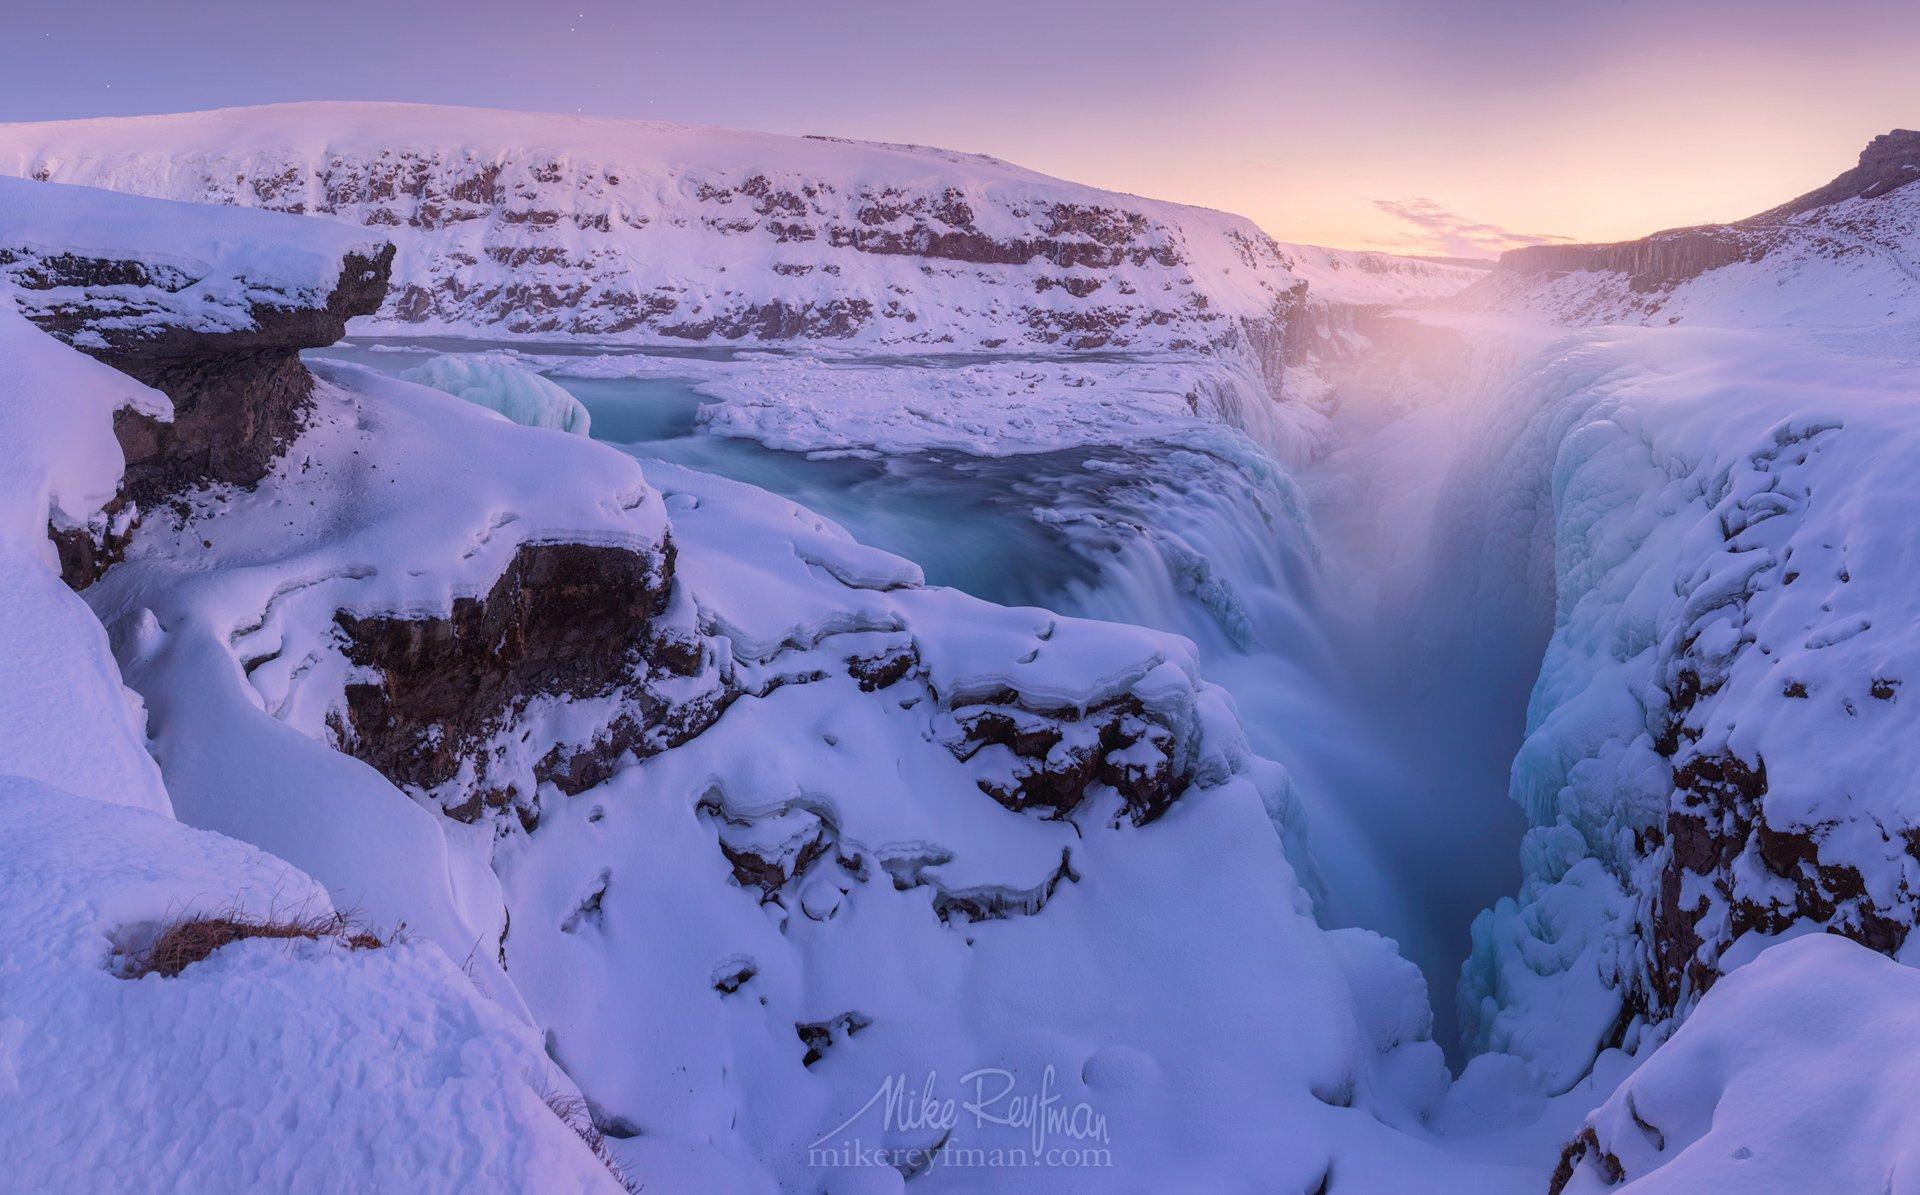 gullfoss, iceland, ice, winter, light, Майк Рейфман